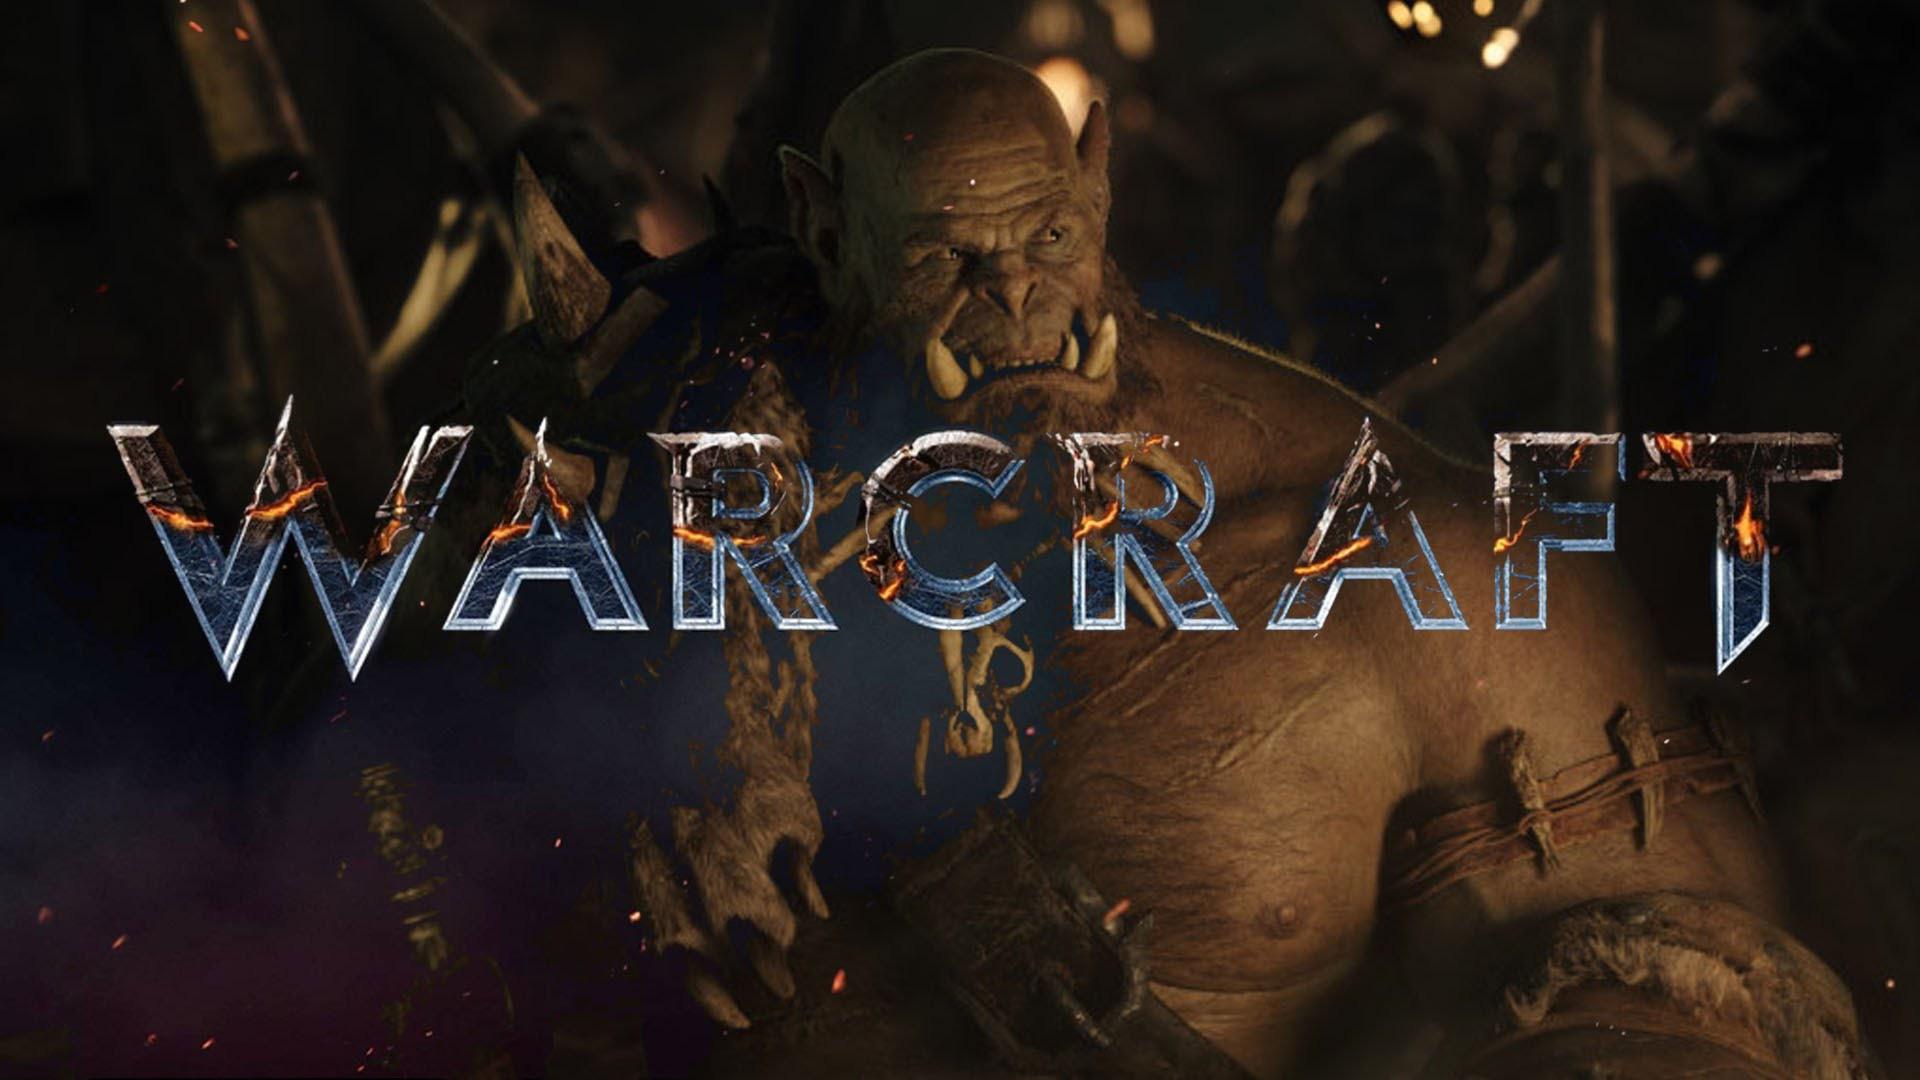 Warcraft Movie Images